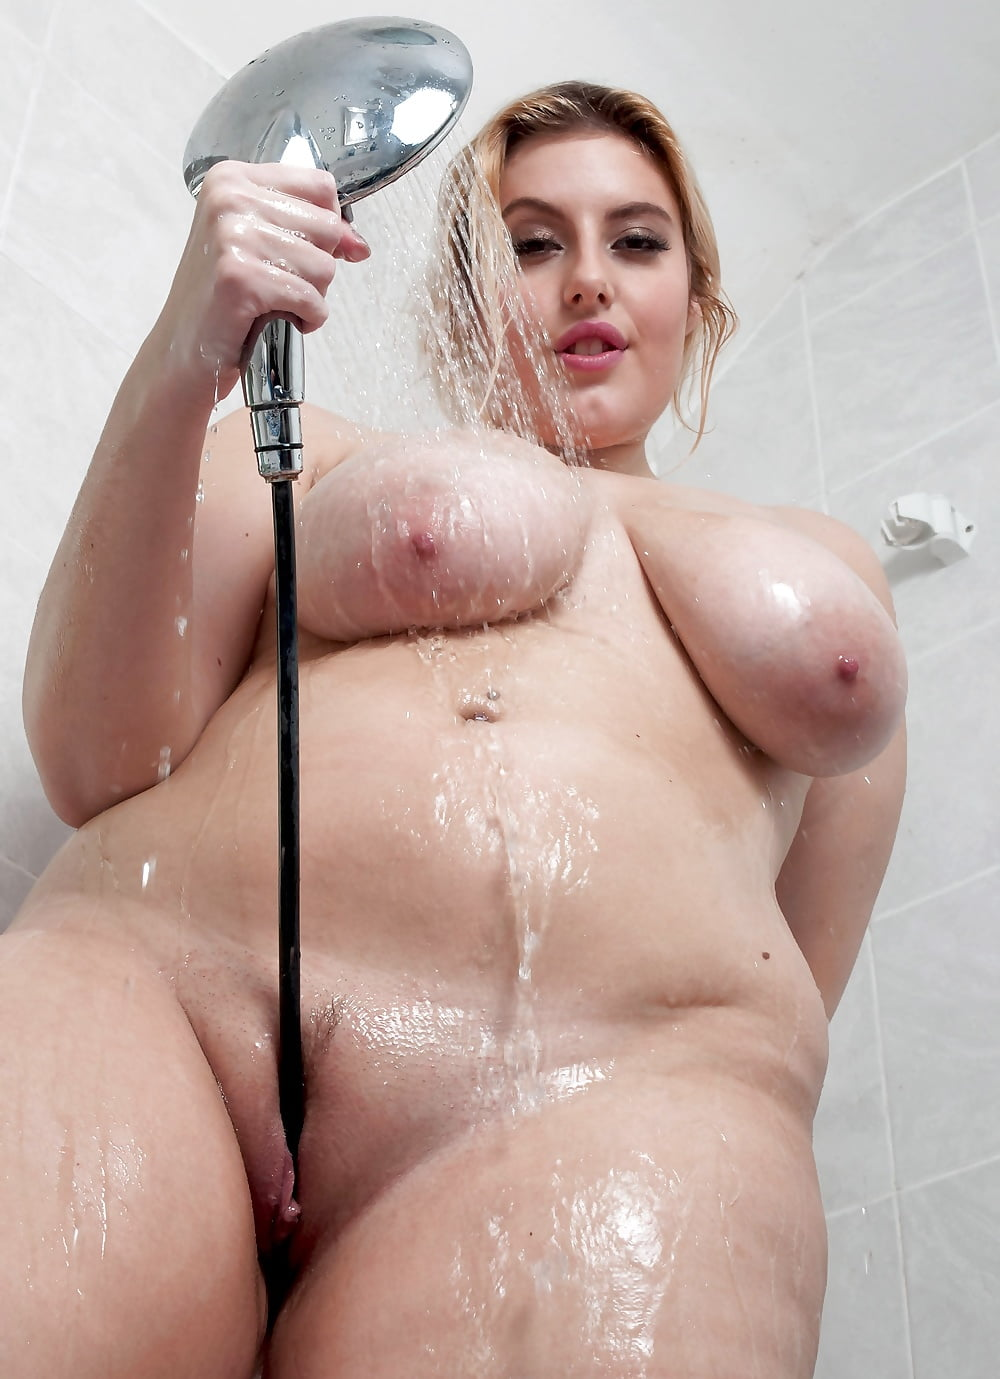 Cute chubby in shower